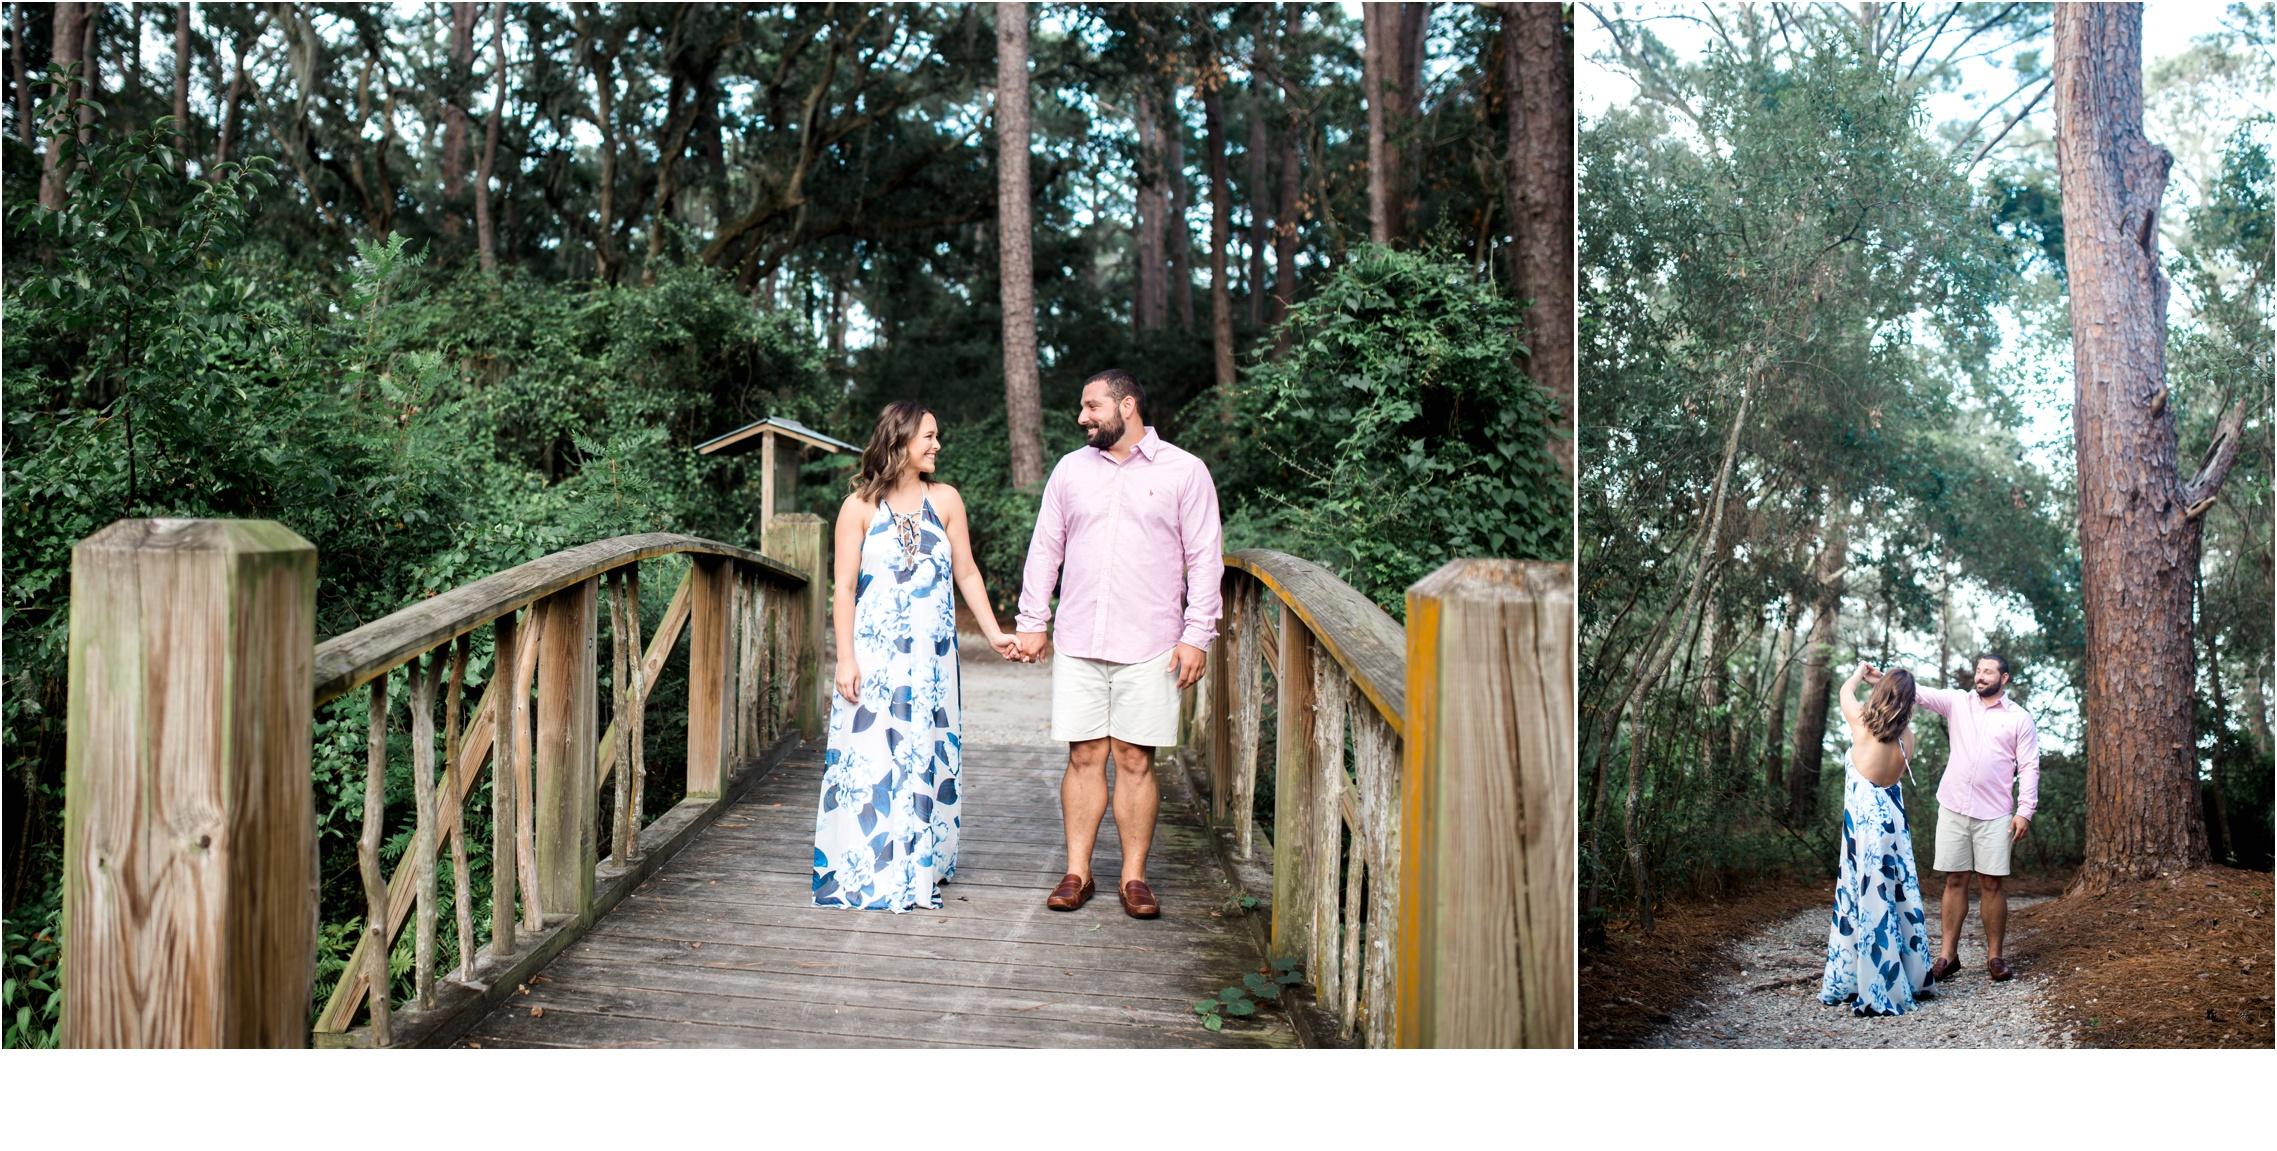 Rainey_Gregg_Photography_St._Simons_Island_Georgia_California_Wedding_Portrait_Photography_0135.jpg